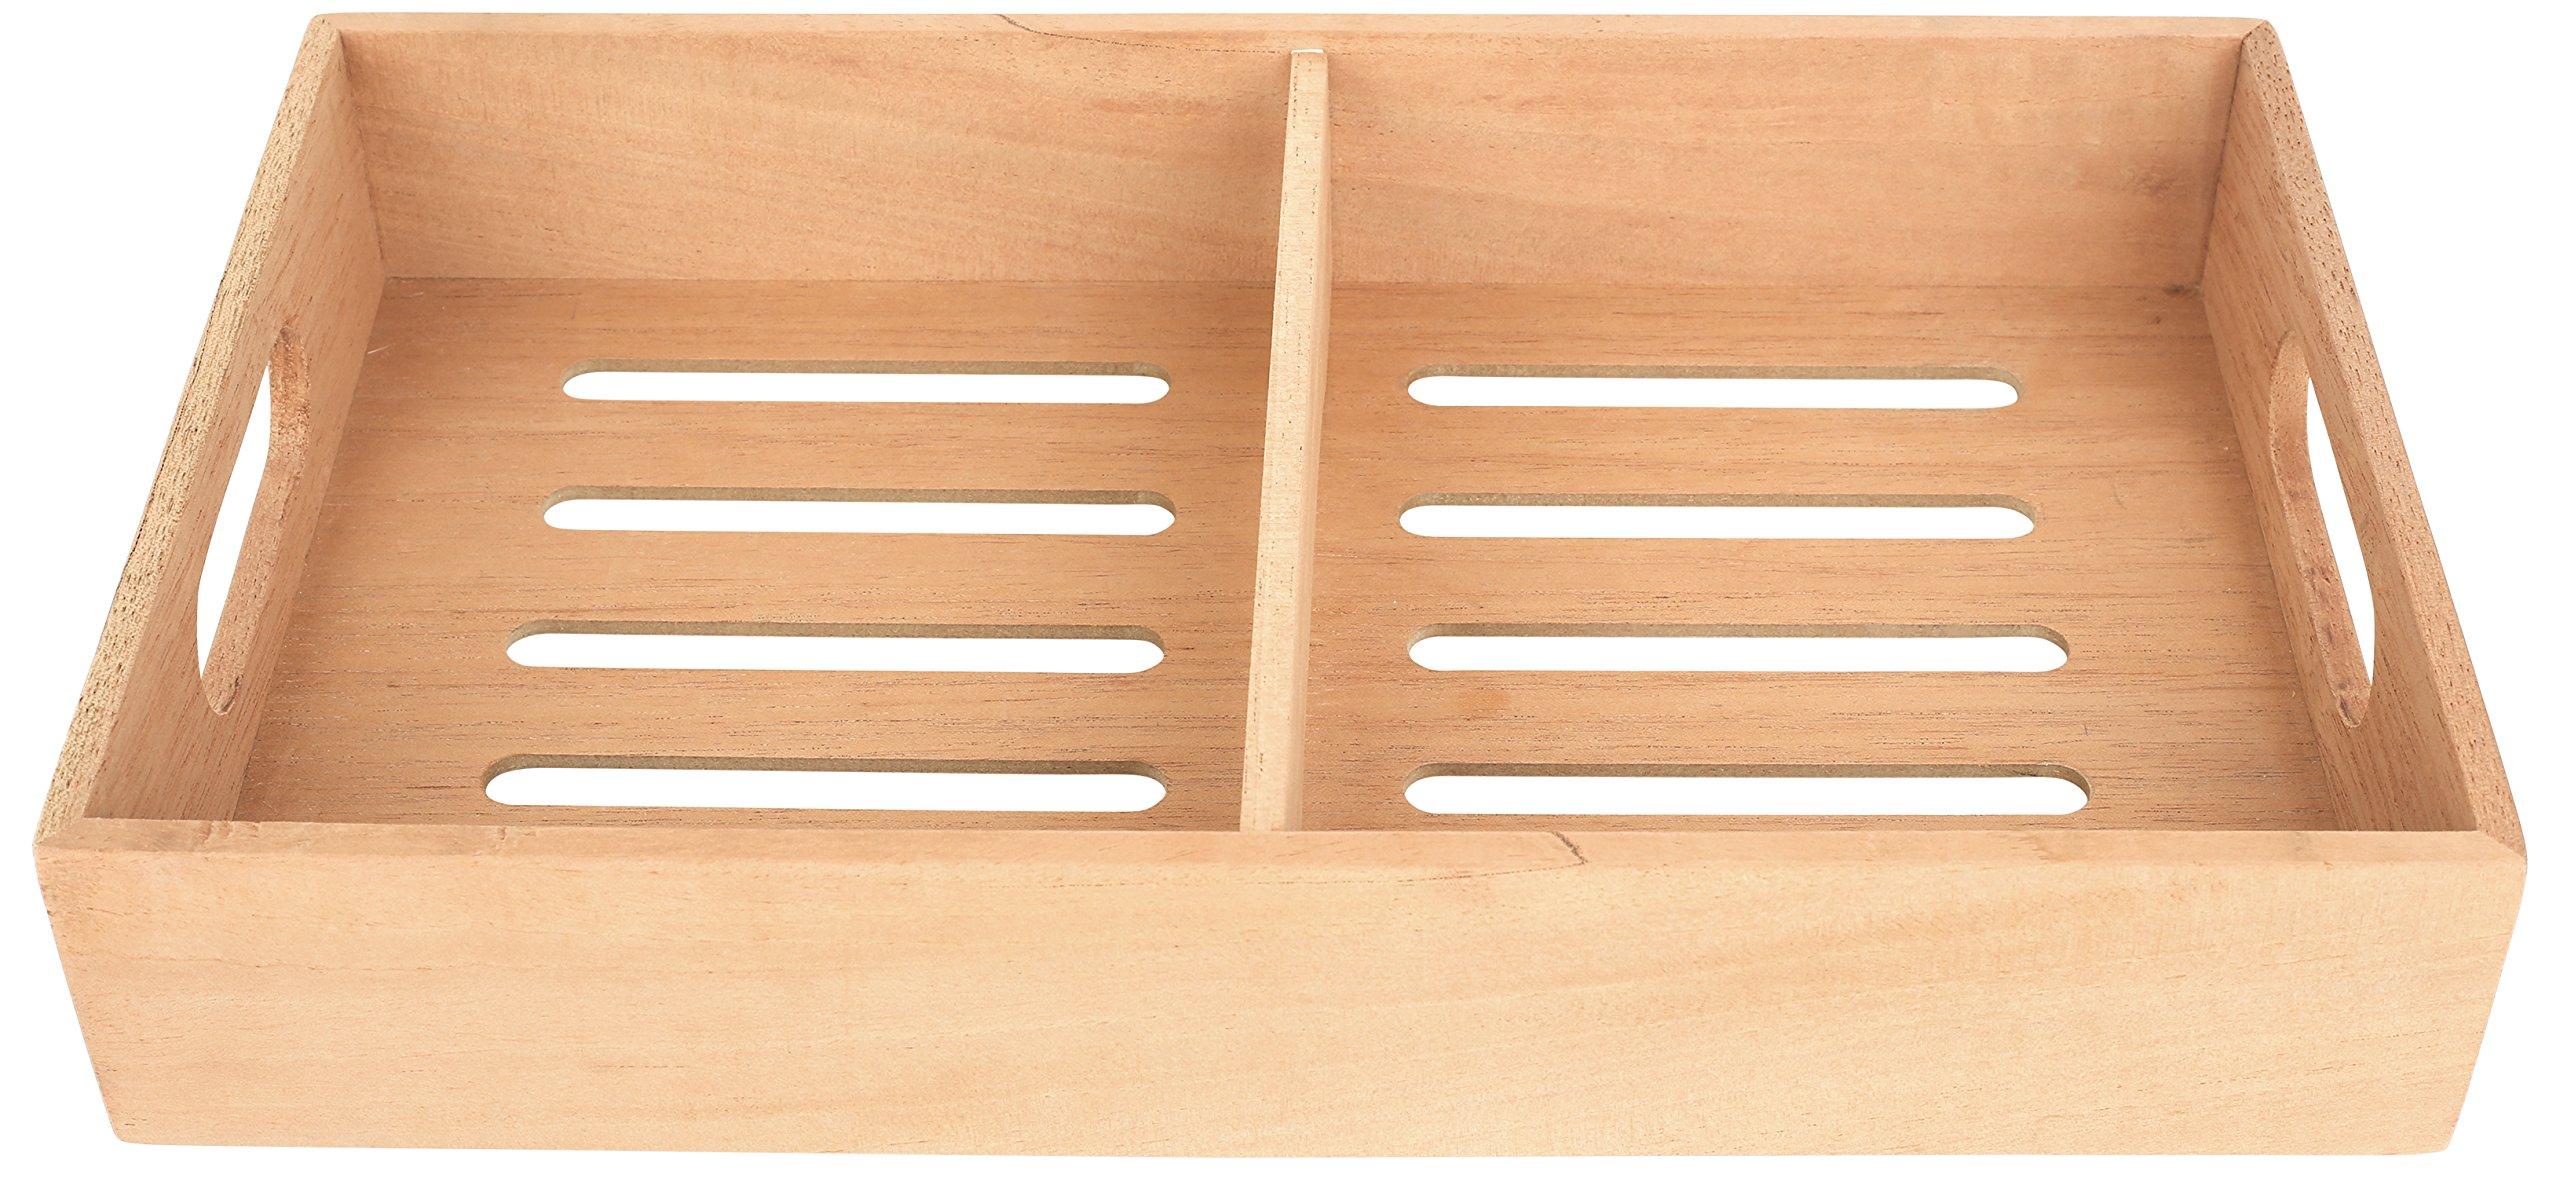 Mantello Solid Spanish Cedar Cigar Tray, Adjustable Divider, Fits Large Humidors, 12.5''x7.5''x2.25''